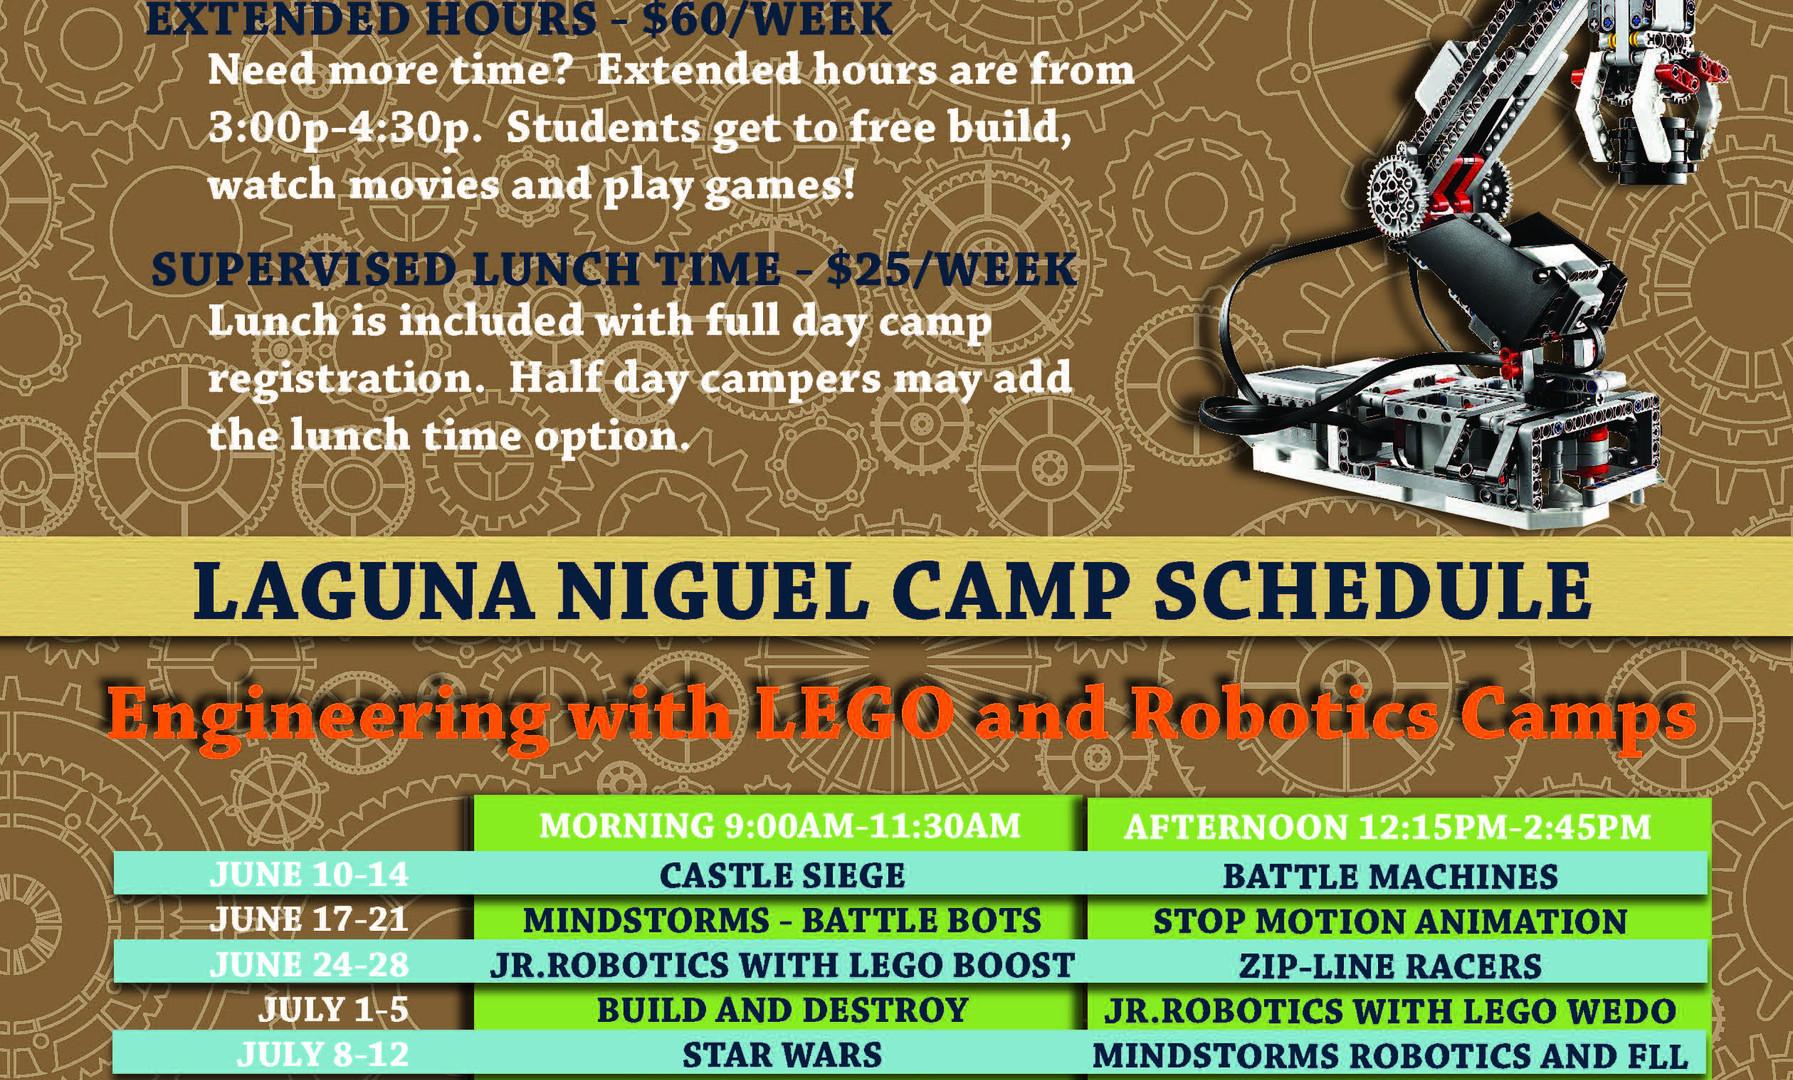 2.laguna camp calendar.jpg